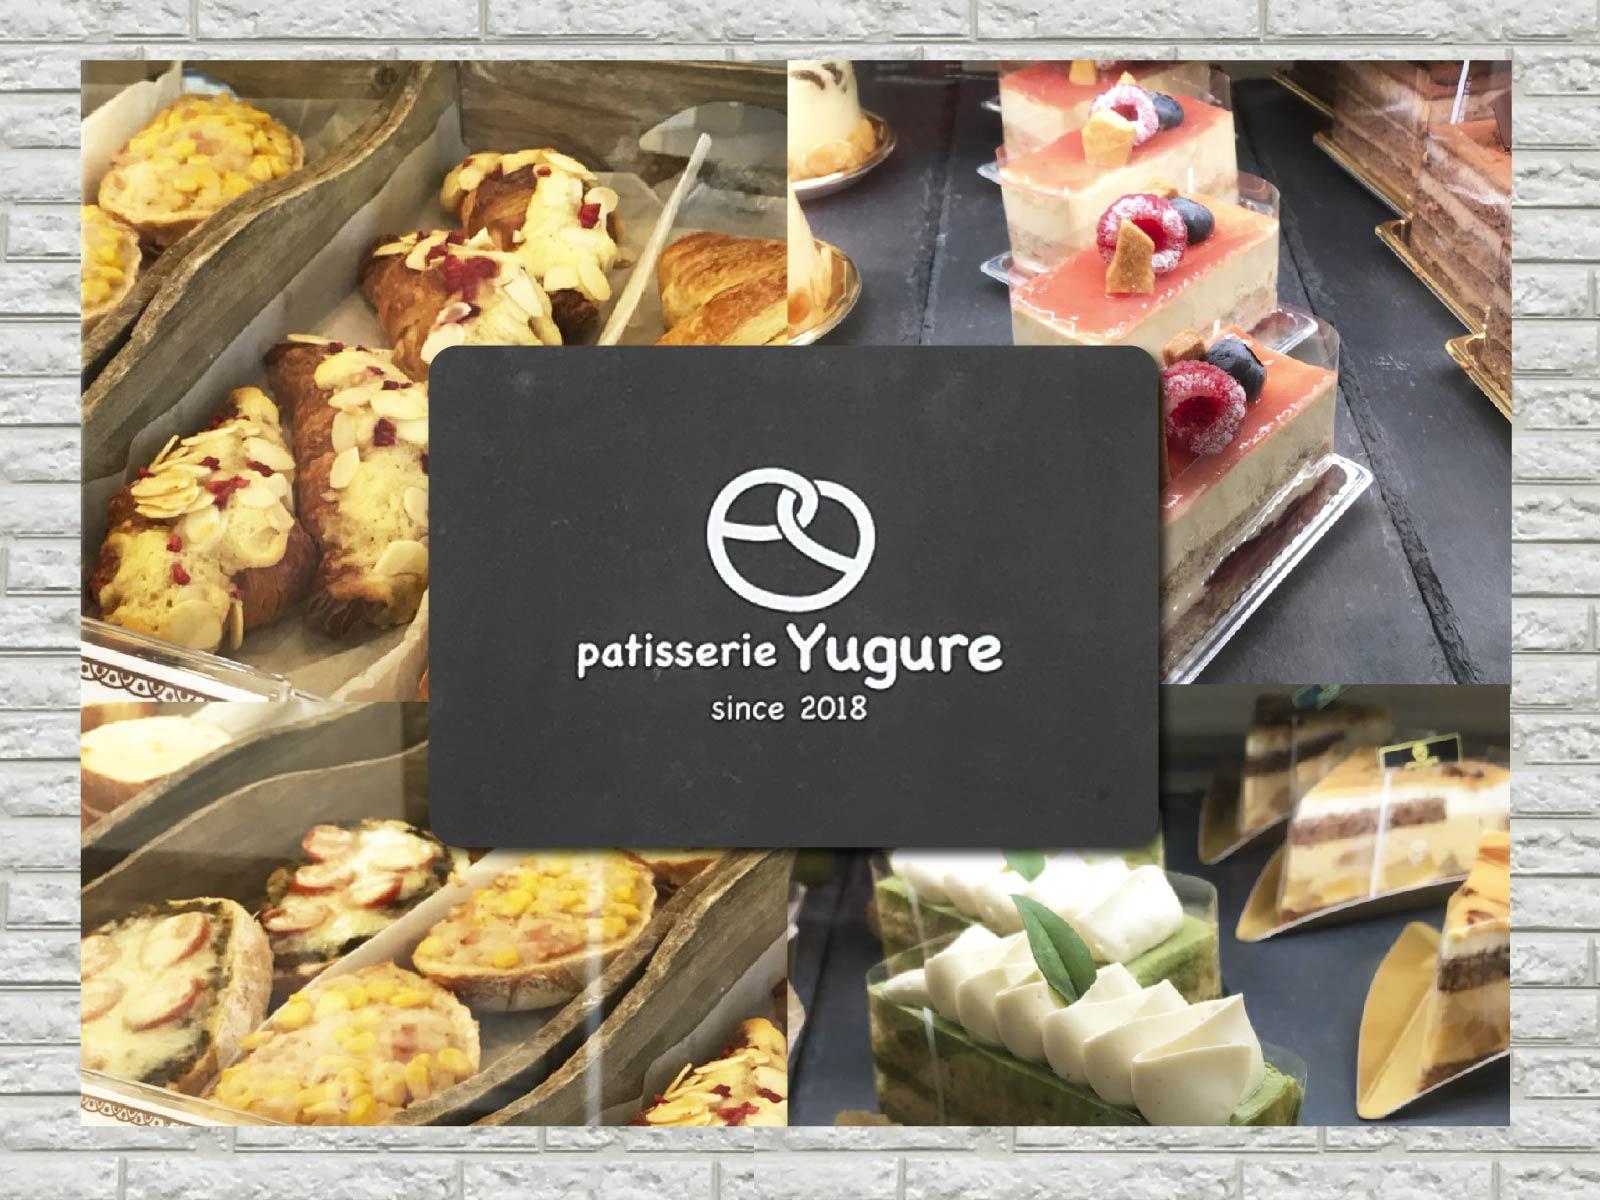 『patisserie  Yugure(パティスリー ユウグレ)』~夕暮れ時に出来たてのパンとケーキでお迎えします~